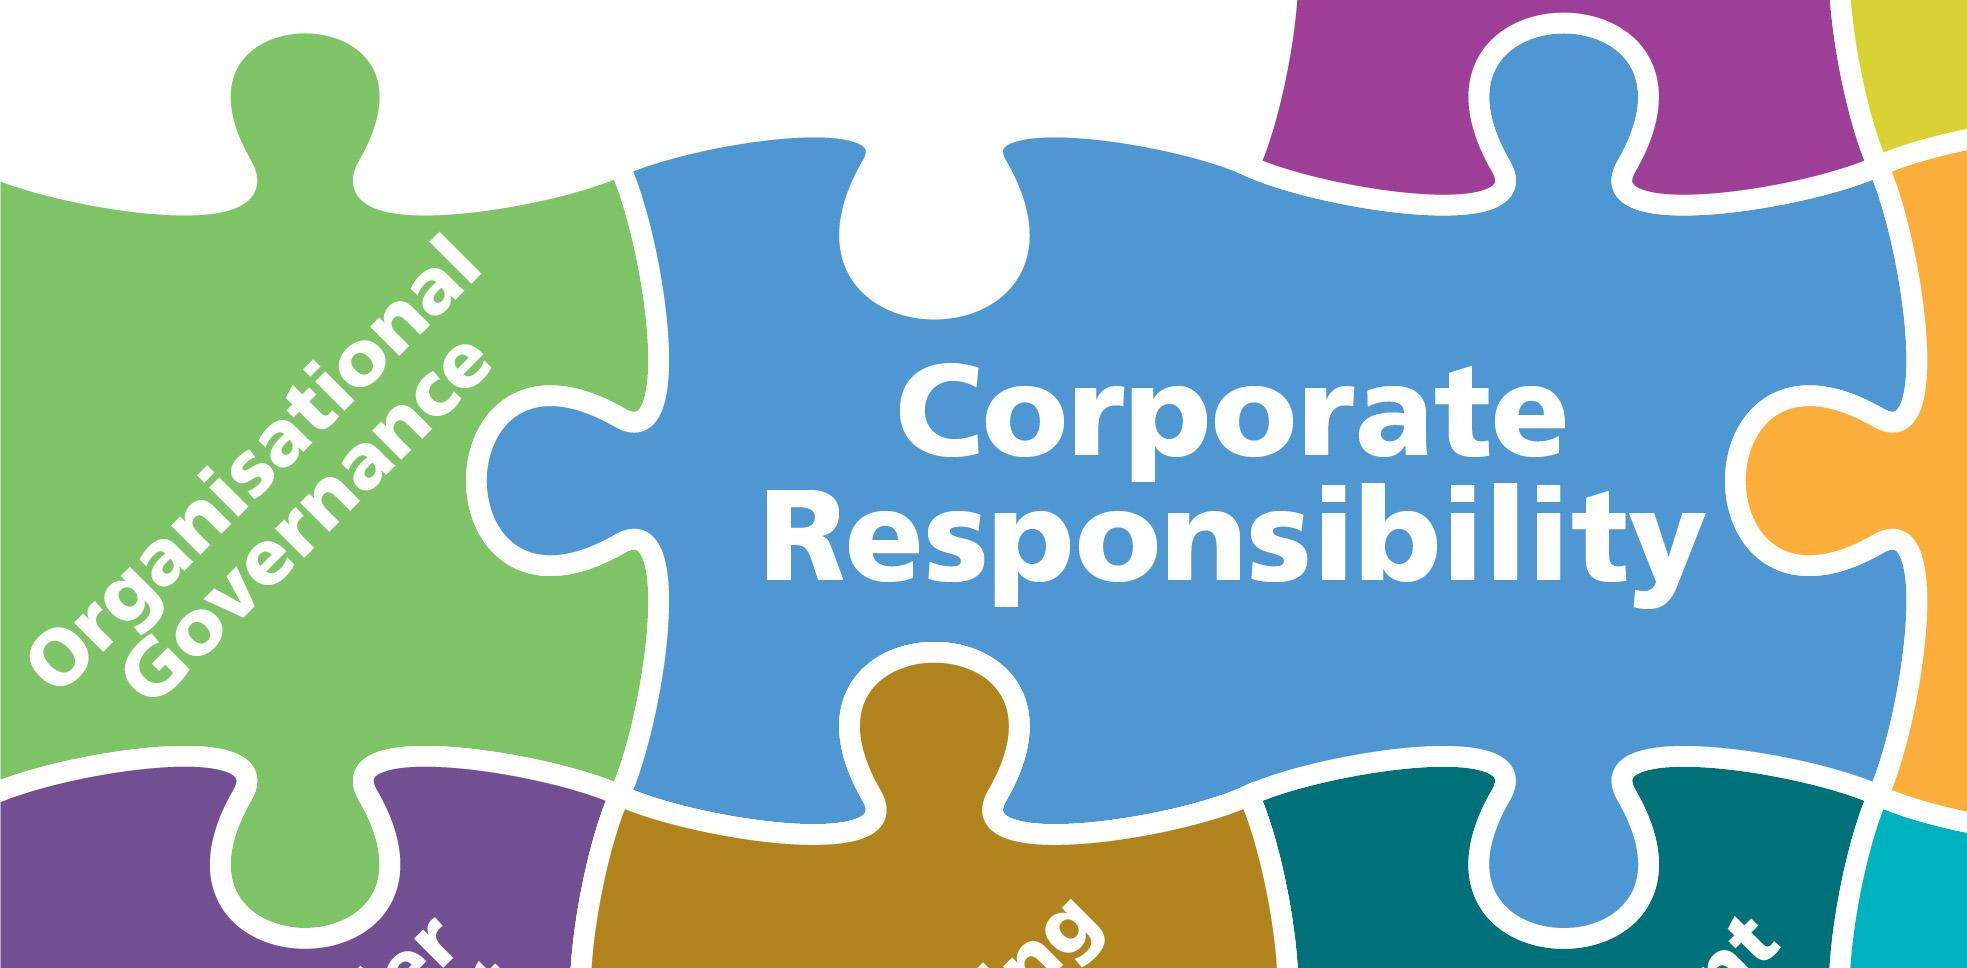 pagcor corporate social responsibility Pagcor corporate social responsibility term paper academic service.